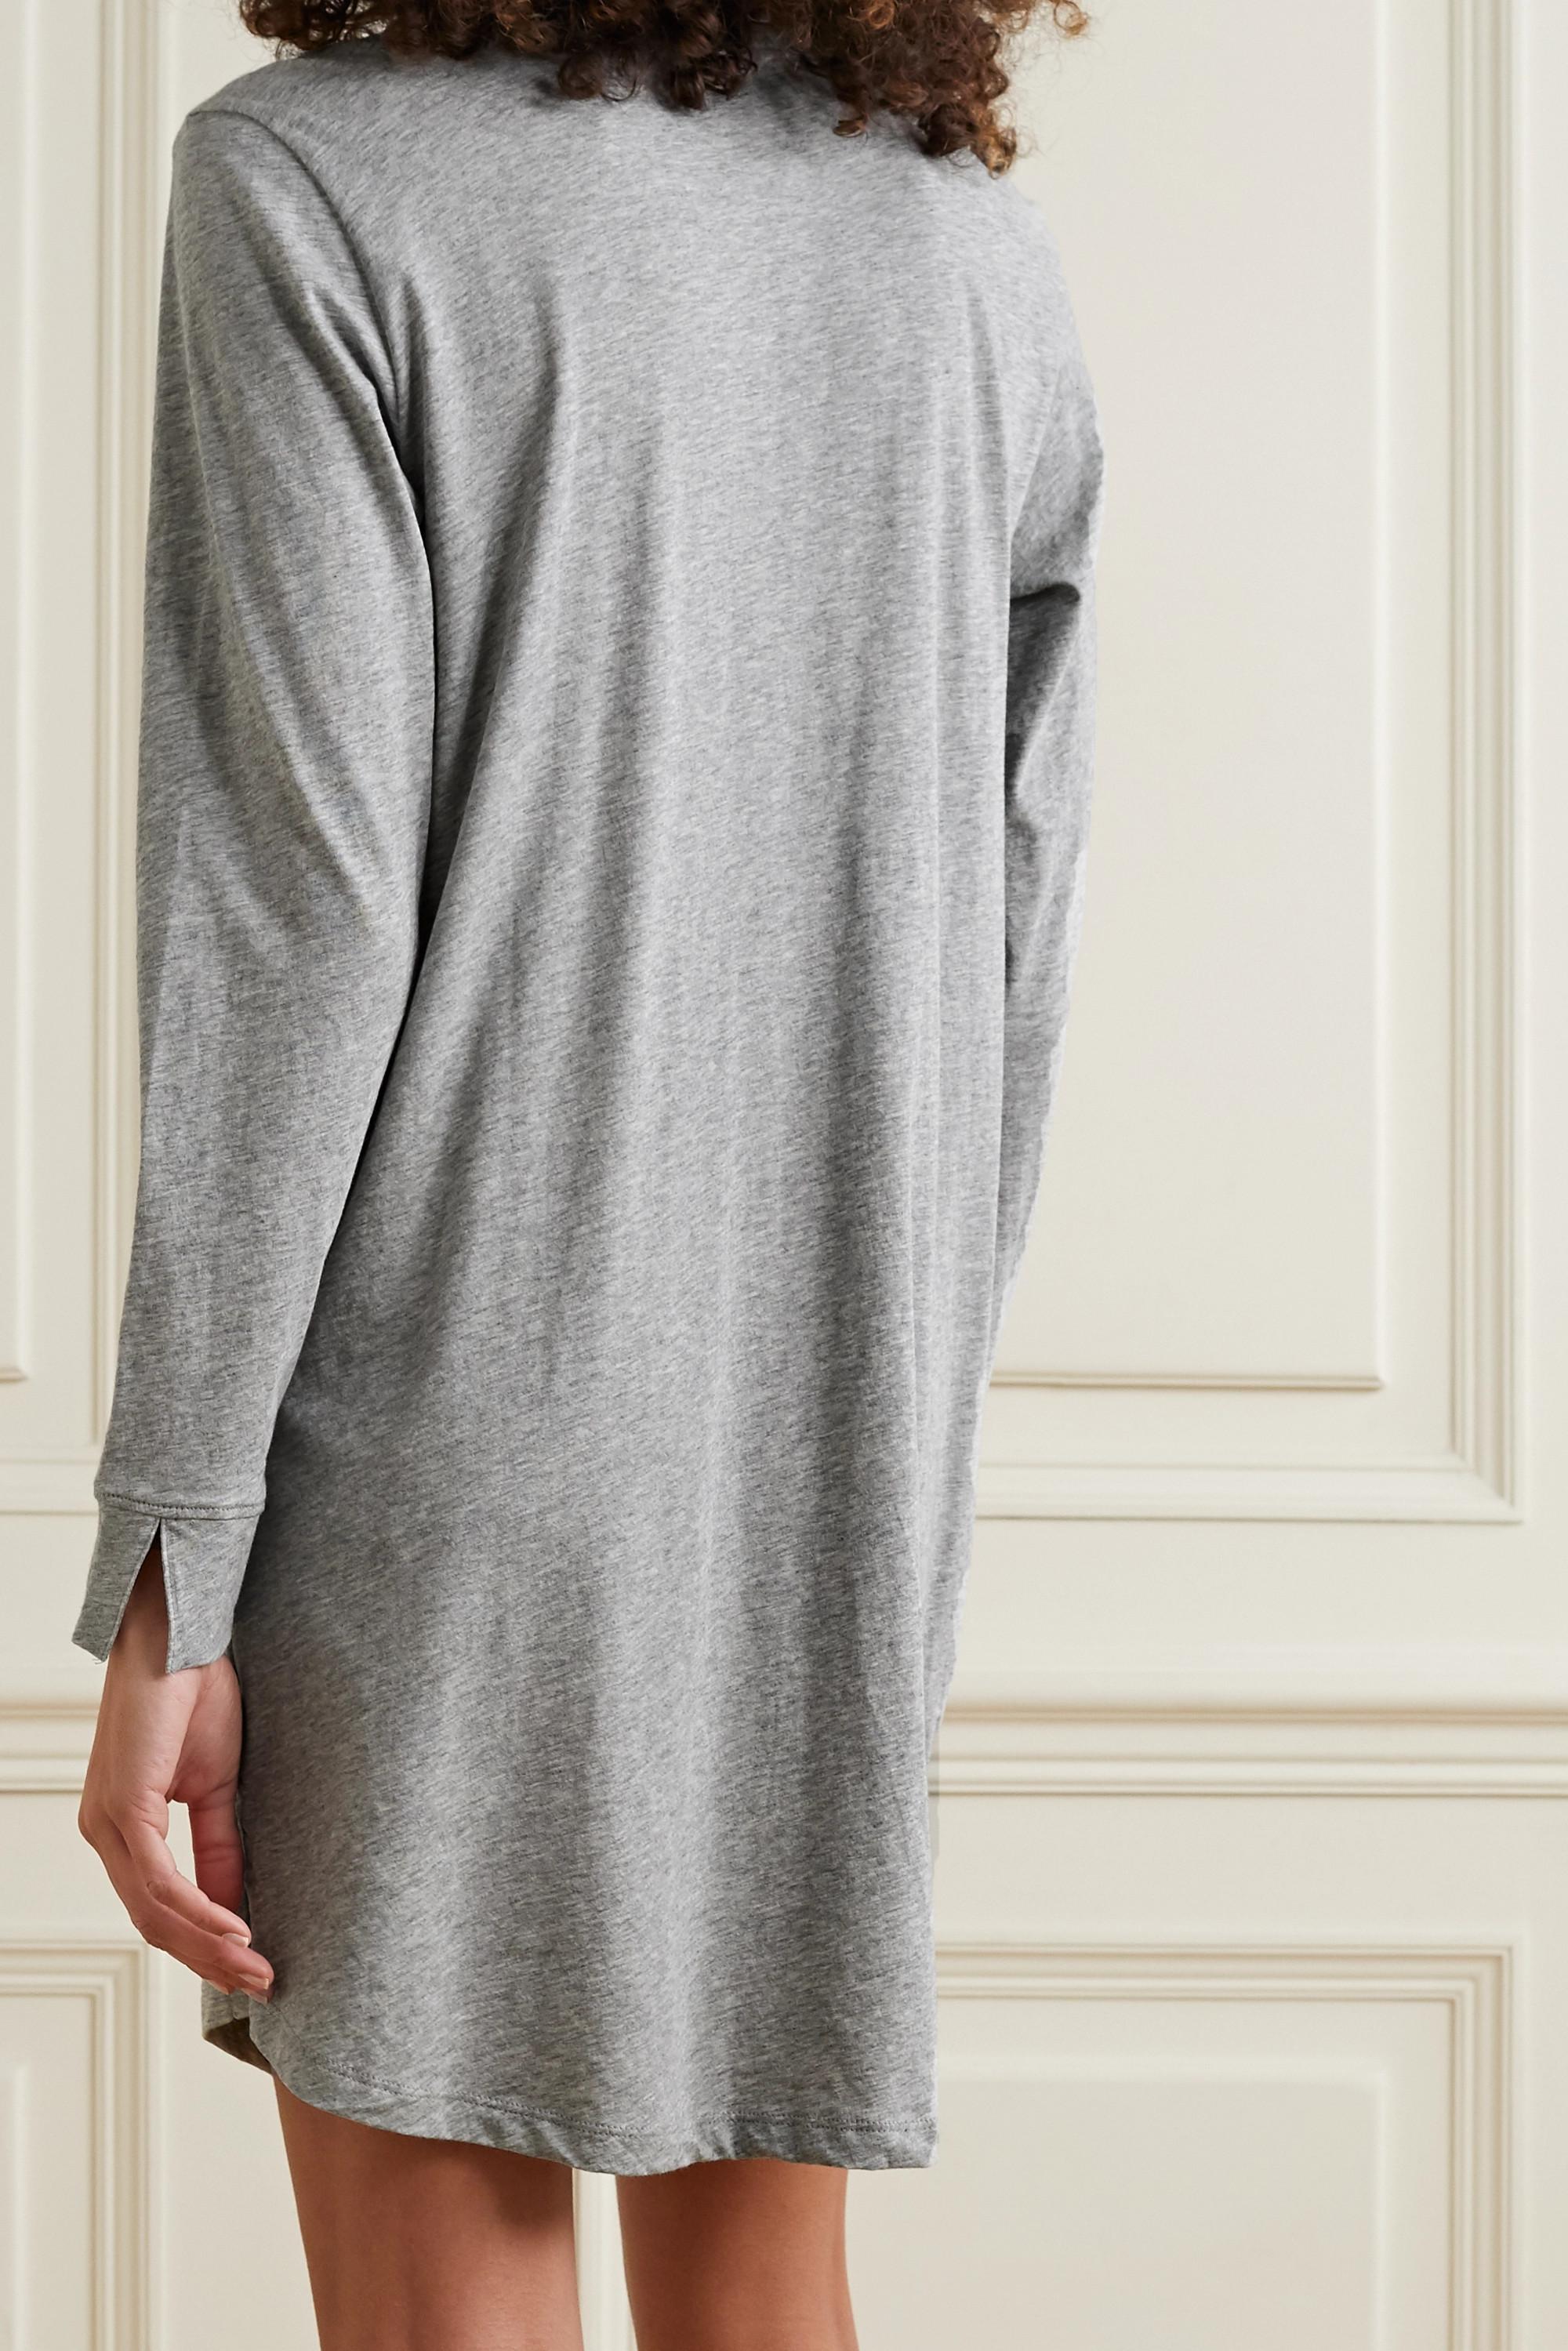 Skin + NET SUSTAIN Cecilia organic Pima cotton-jersey nightdress